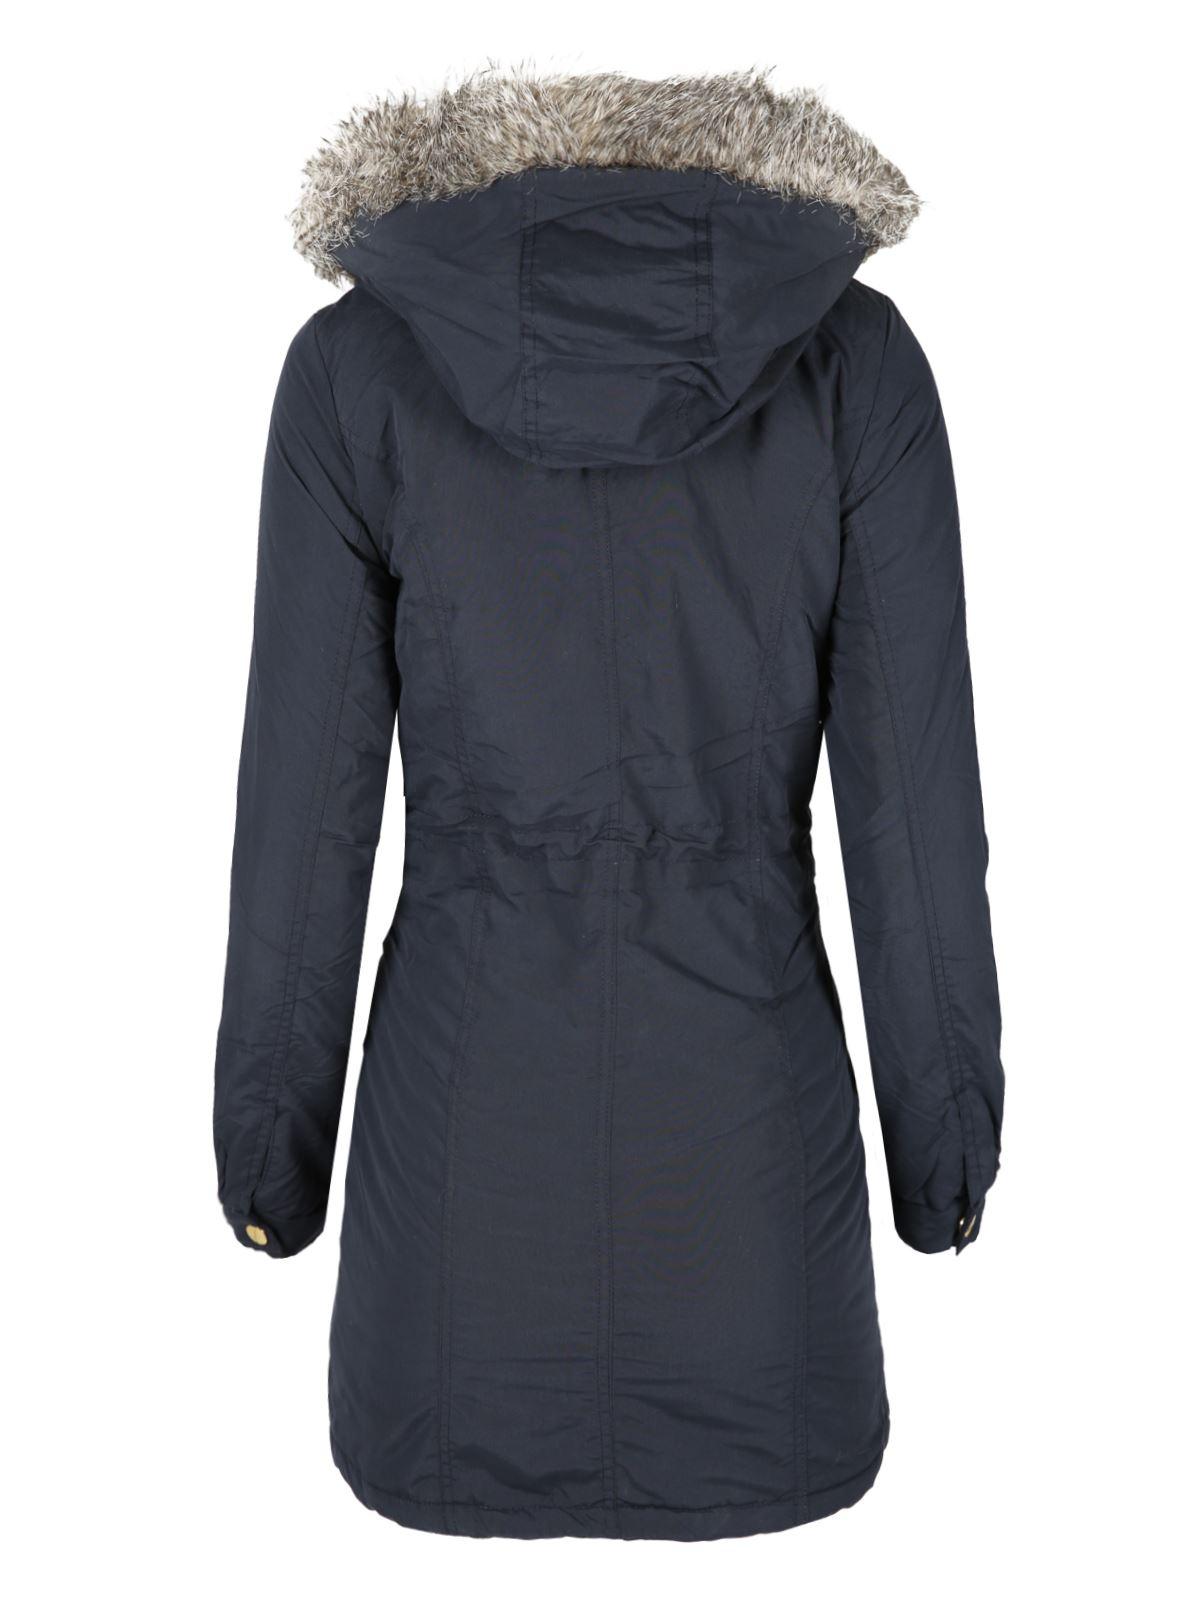 Womens plus size winter coat